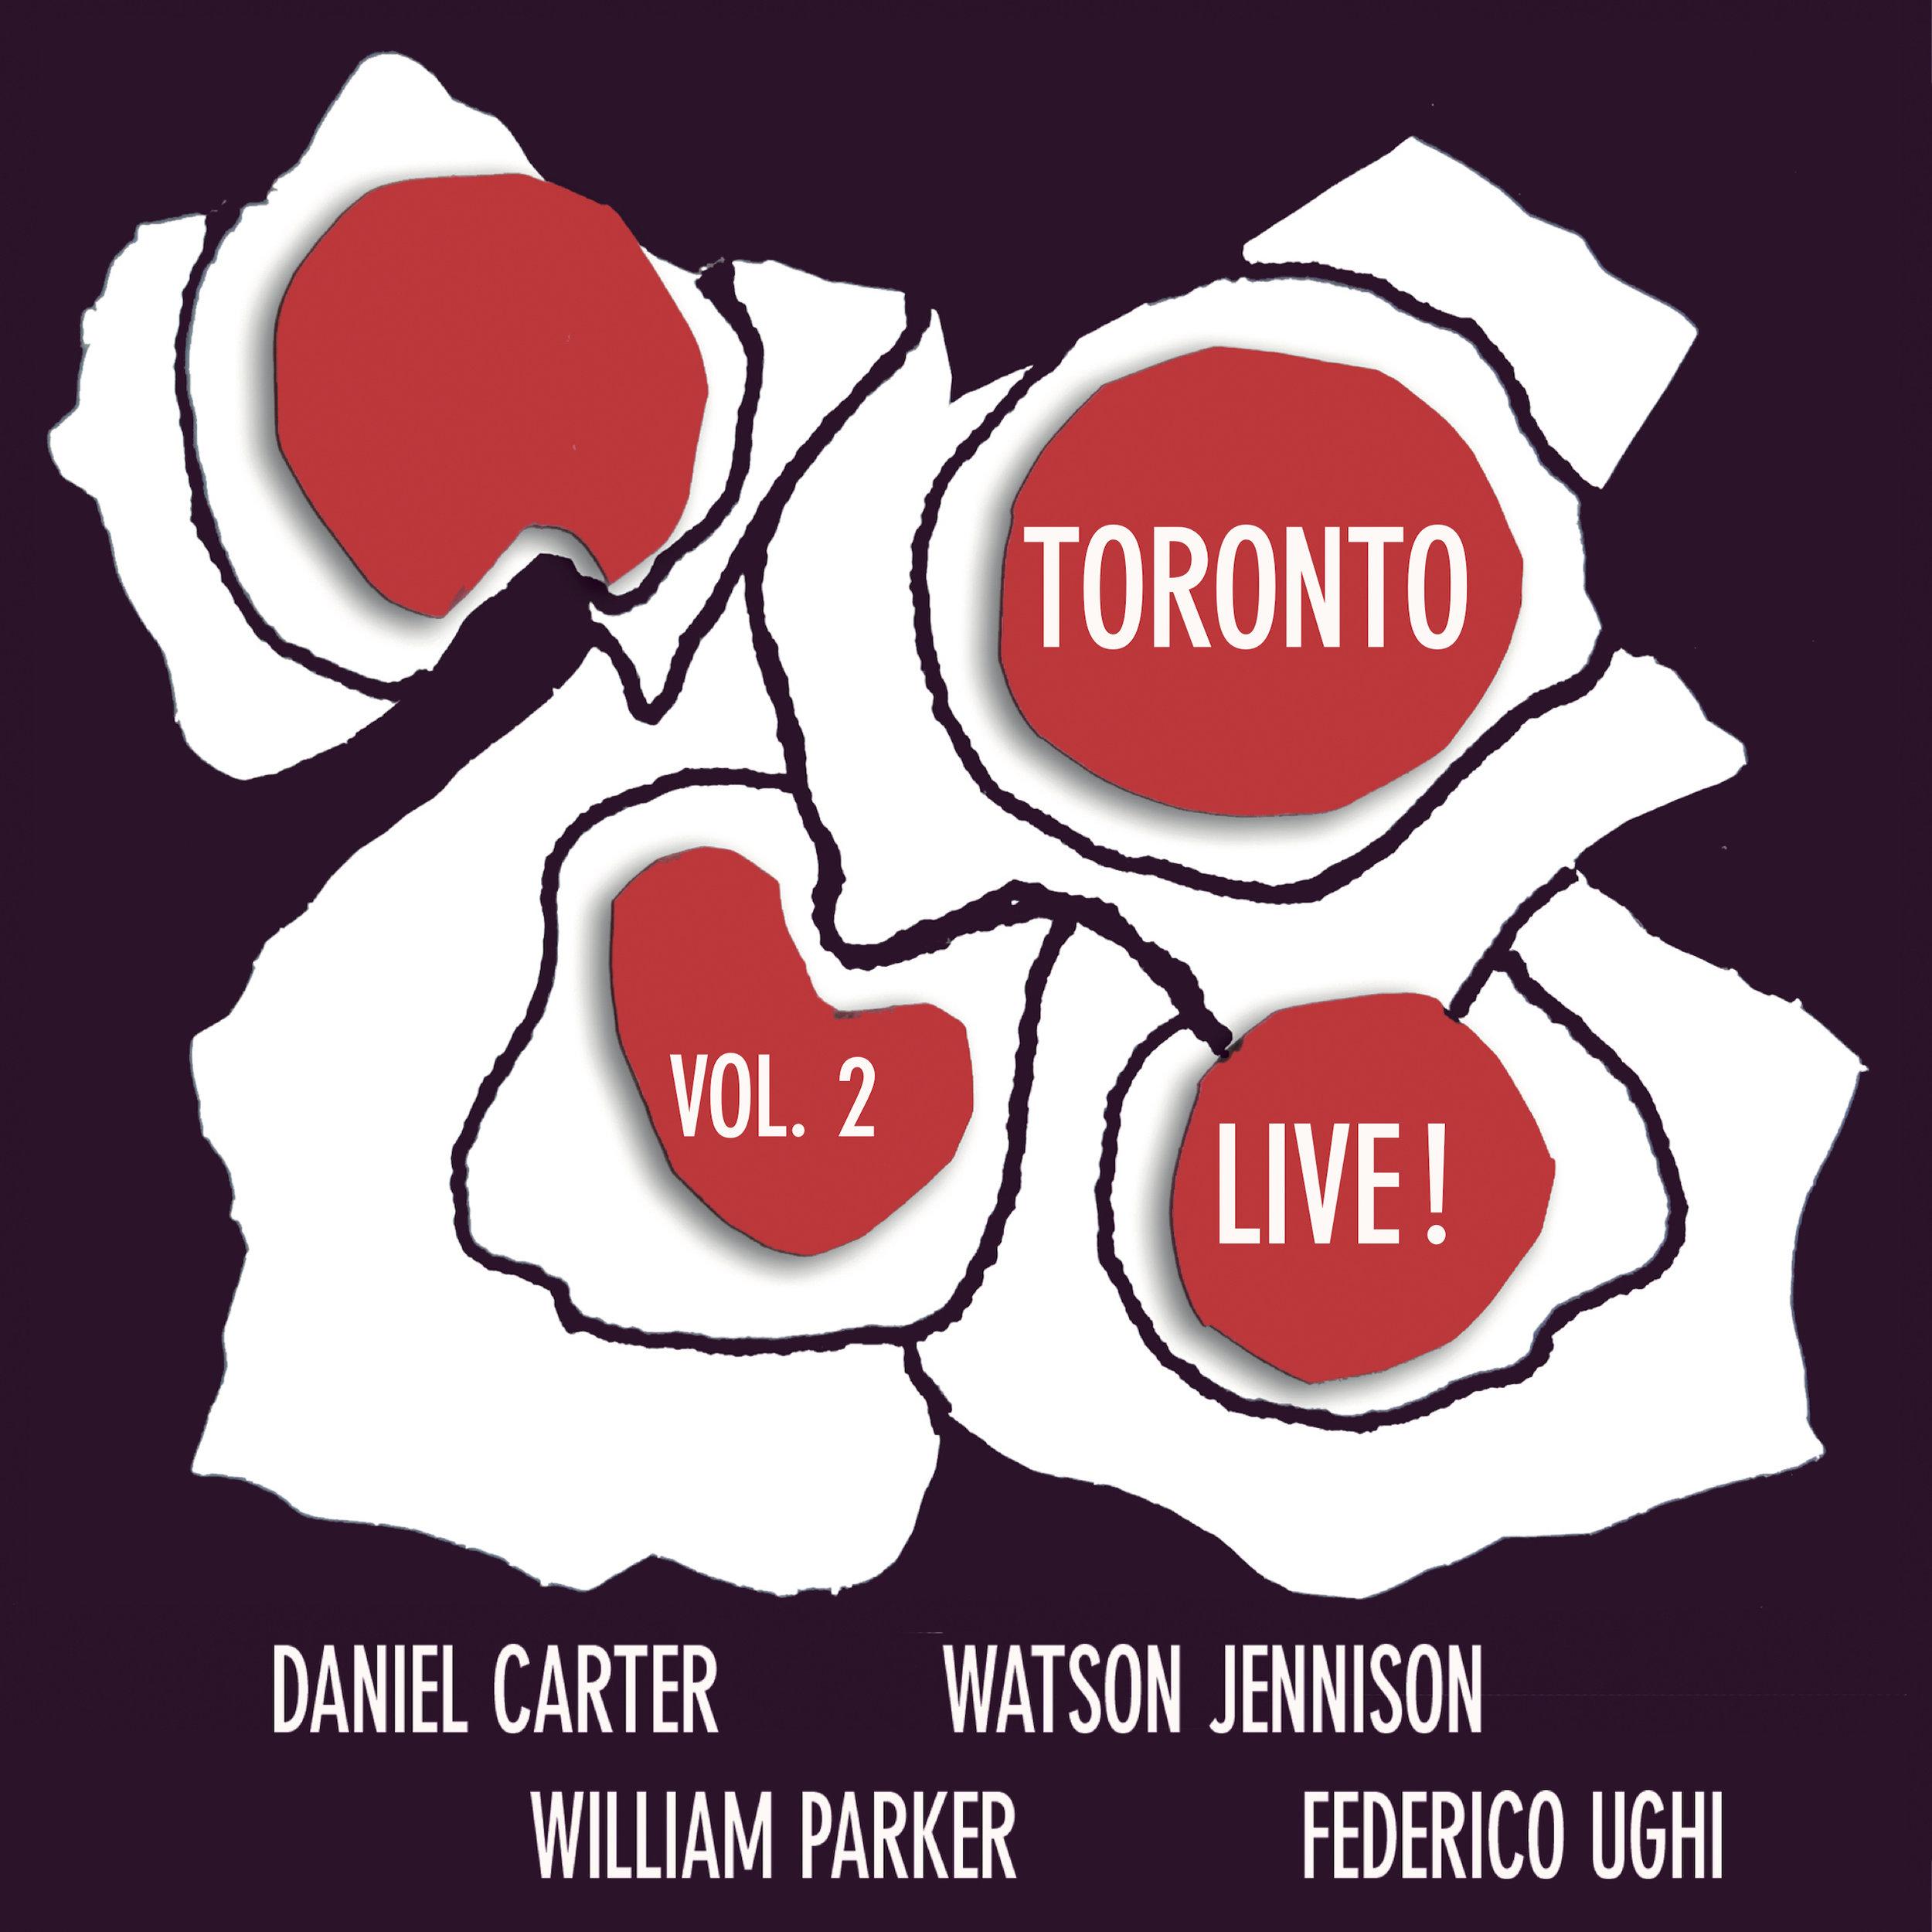 Vol. 2 Toronto.jpg